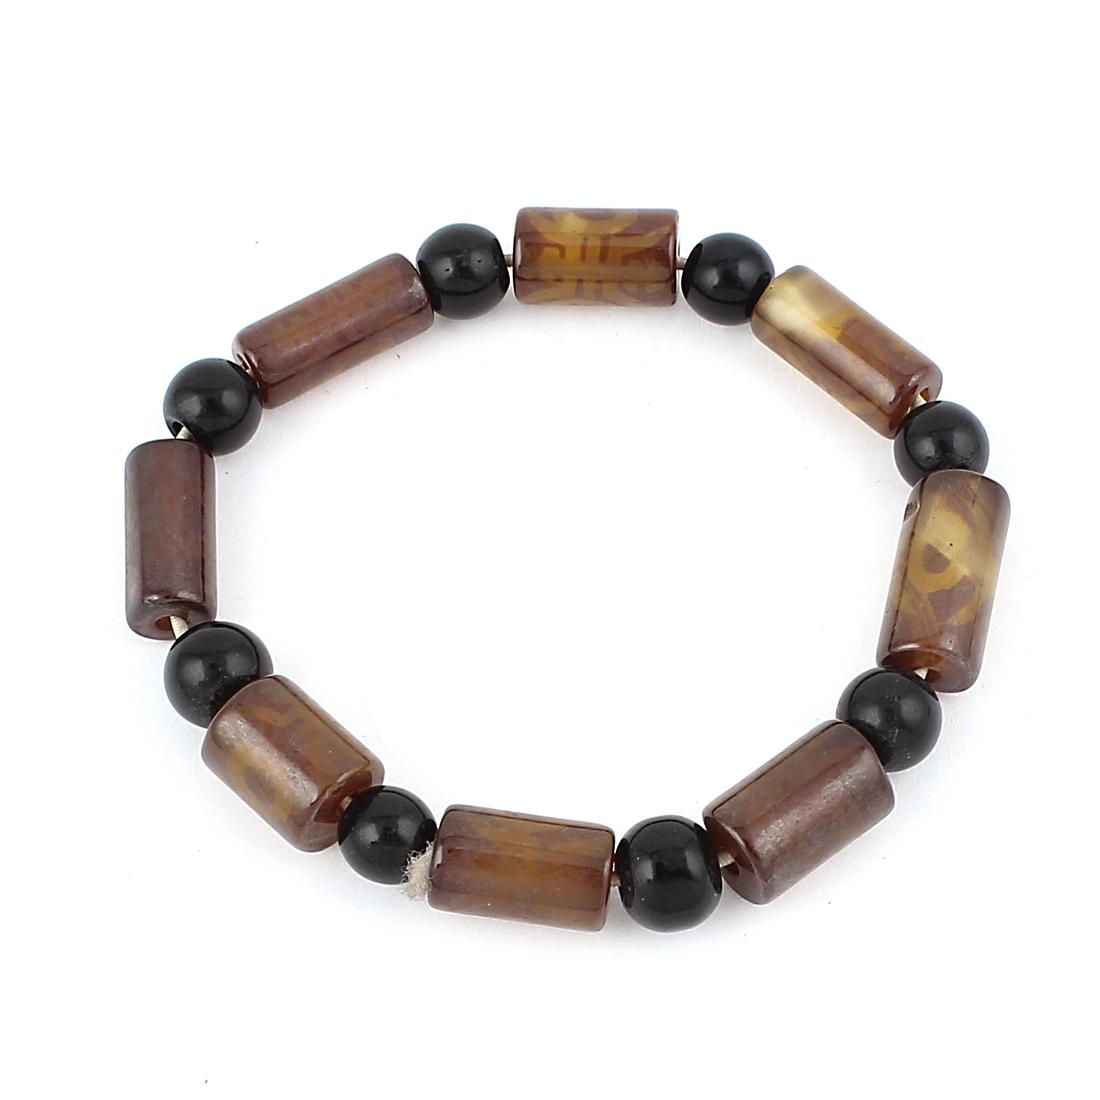 Tibetan Tibet Jewelry DZI Beads Amulet Lucky Bangle Bracelet Black Brown